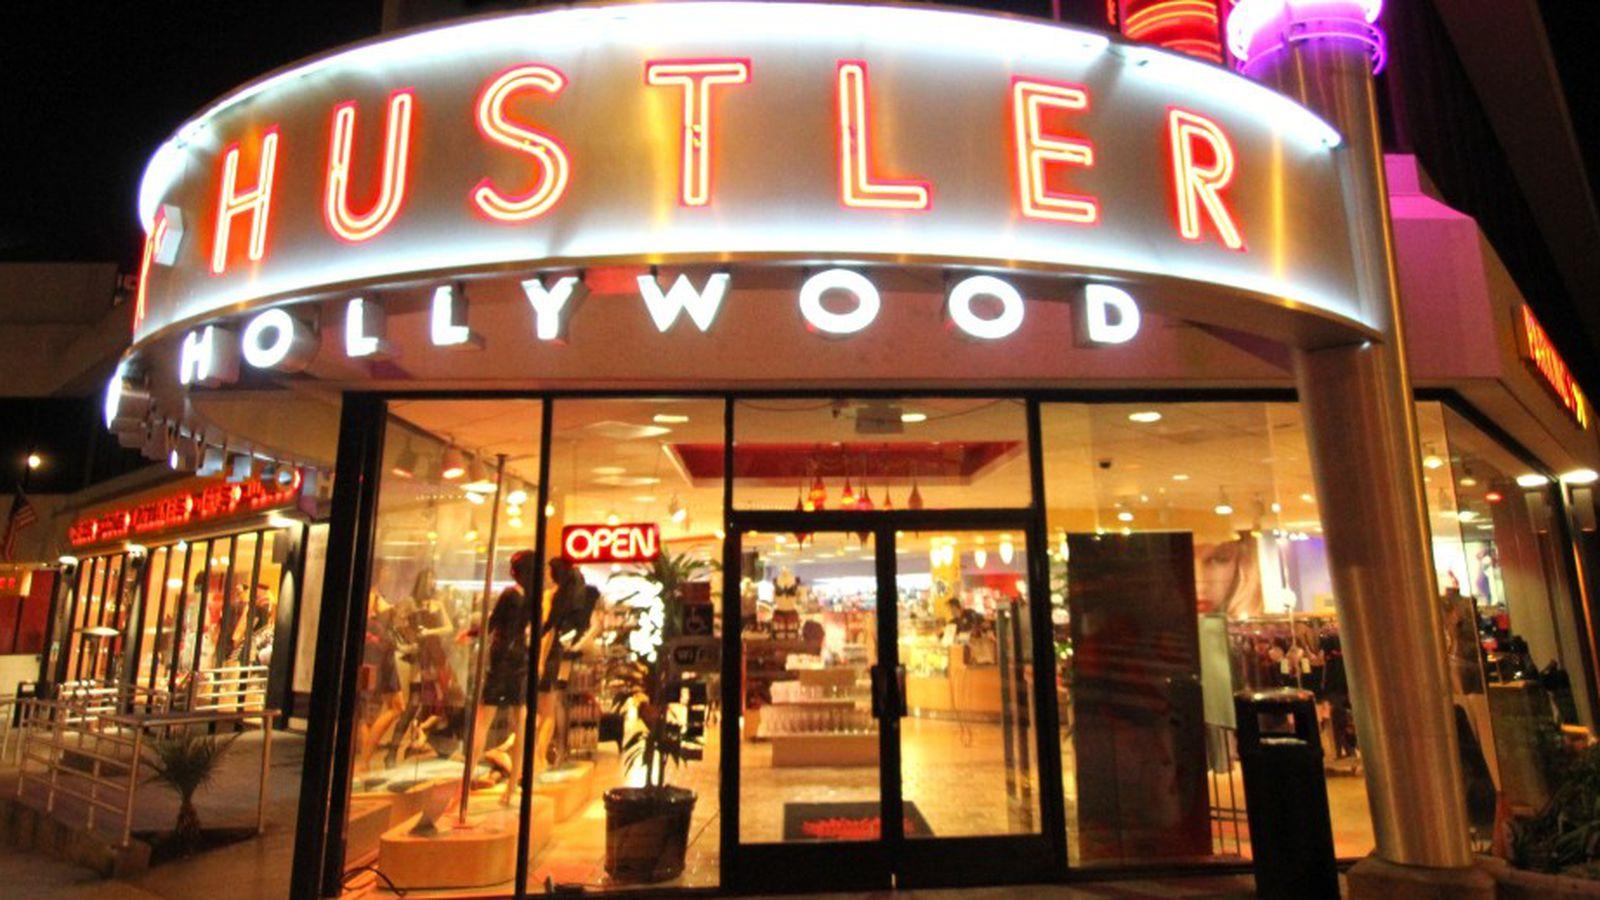 Hollywood hustler ohio, partying girls